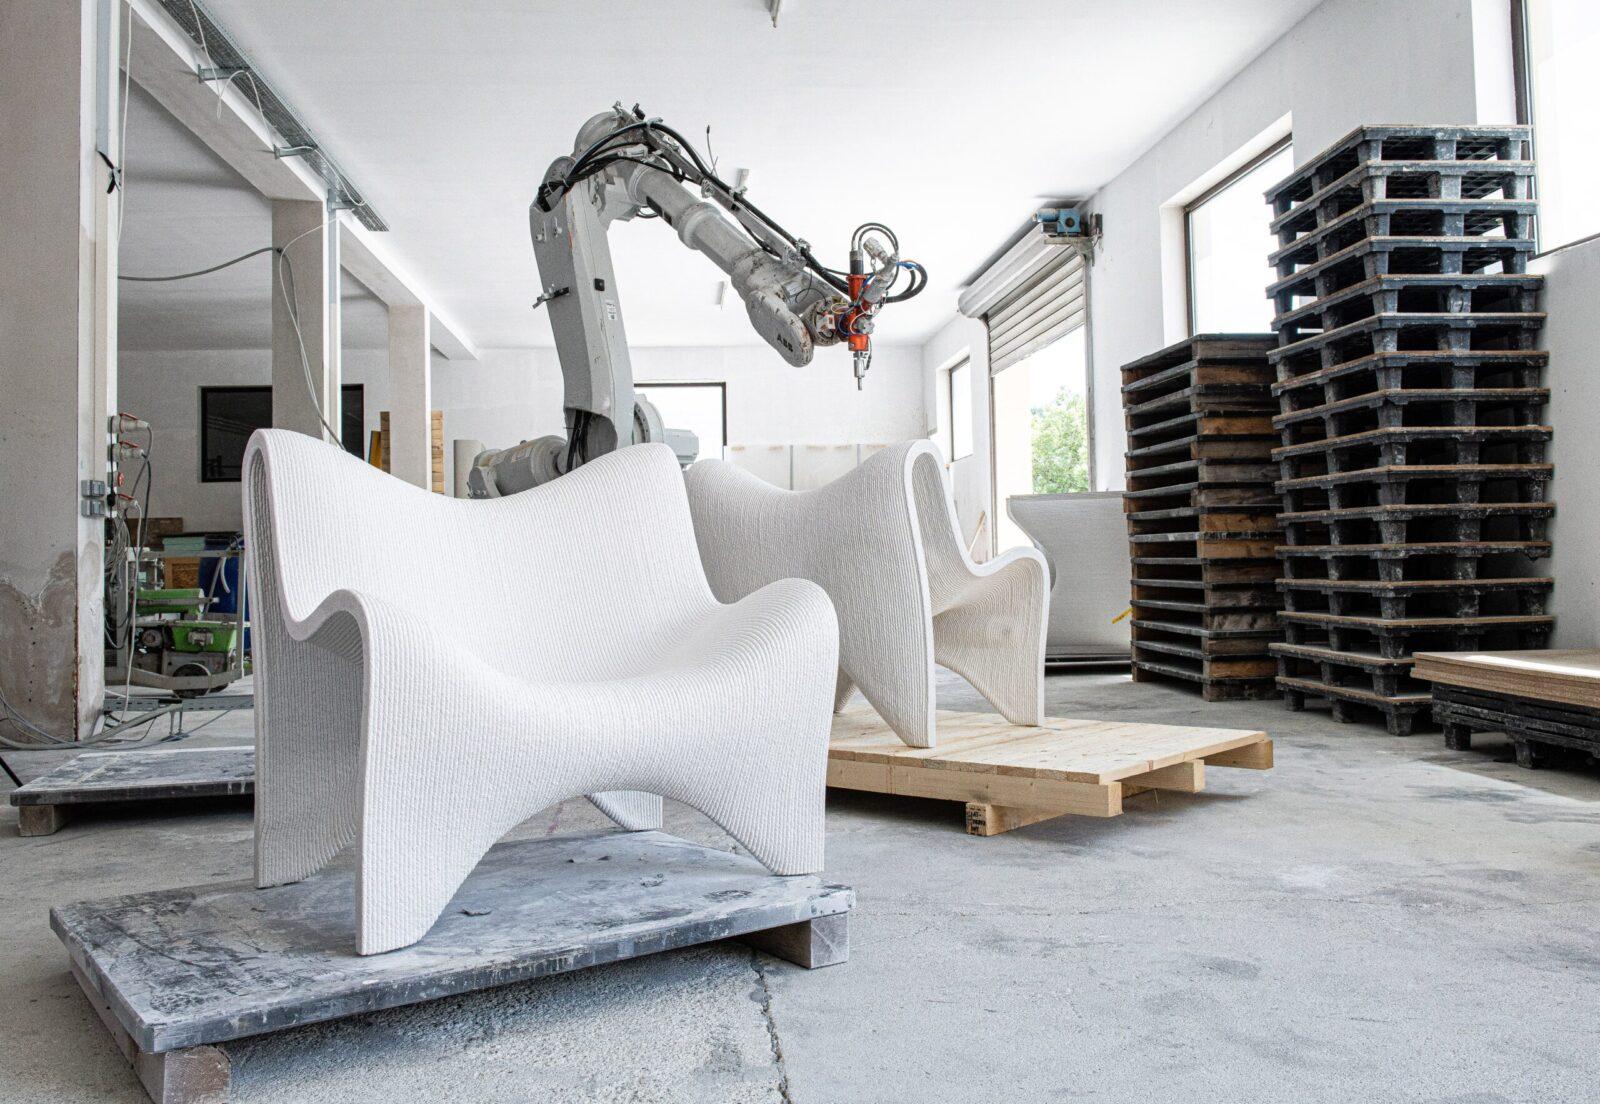 3D-printed street furniture